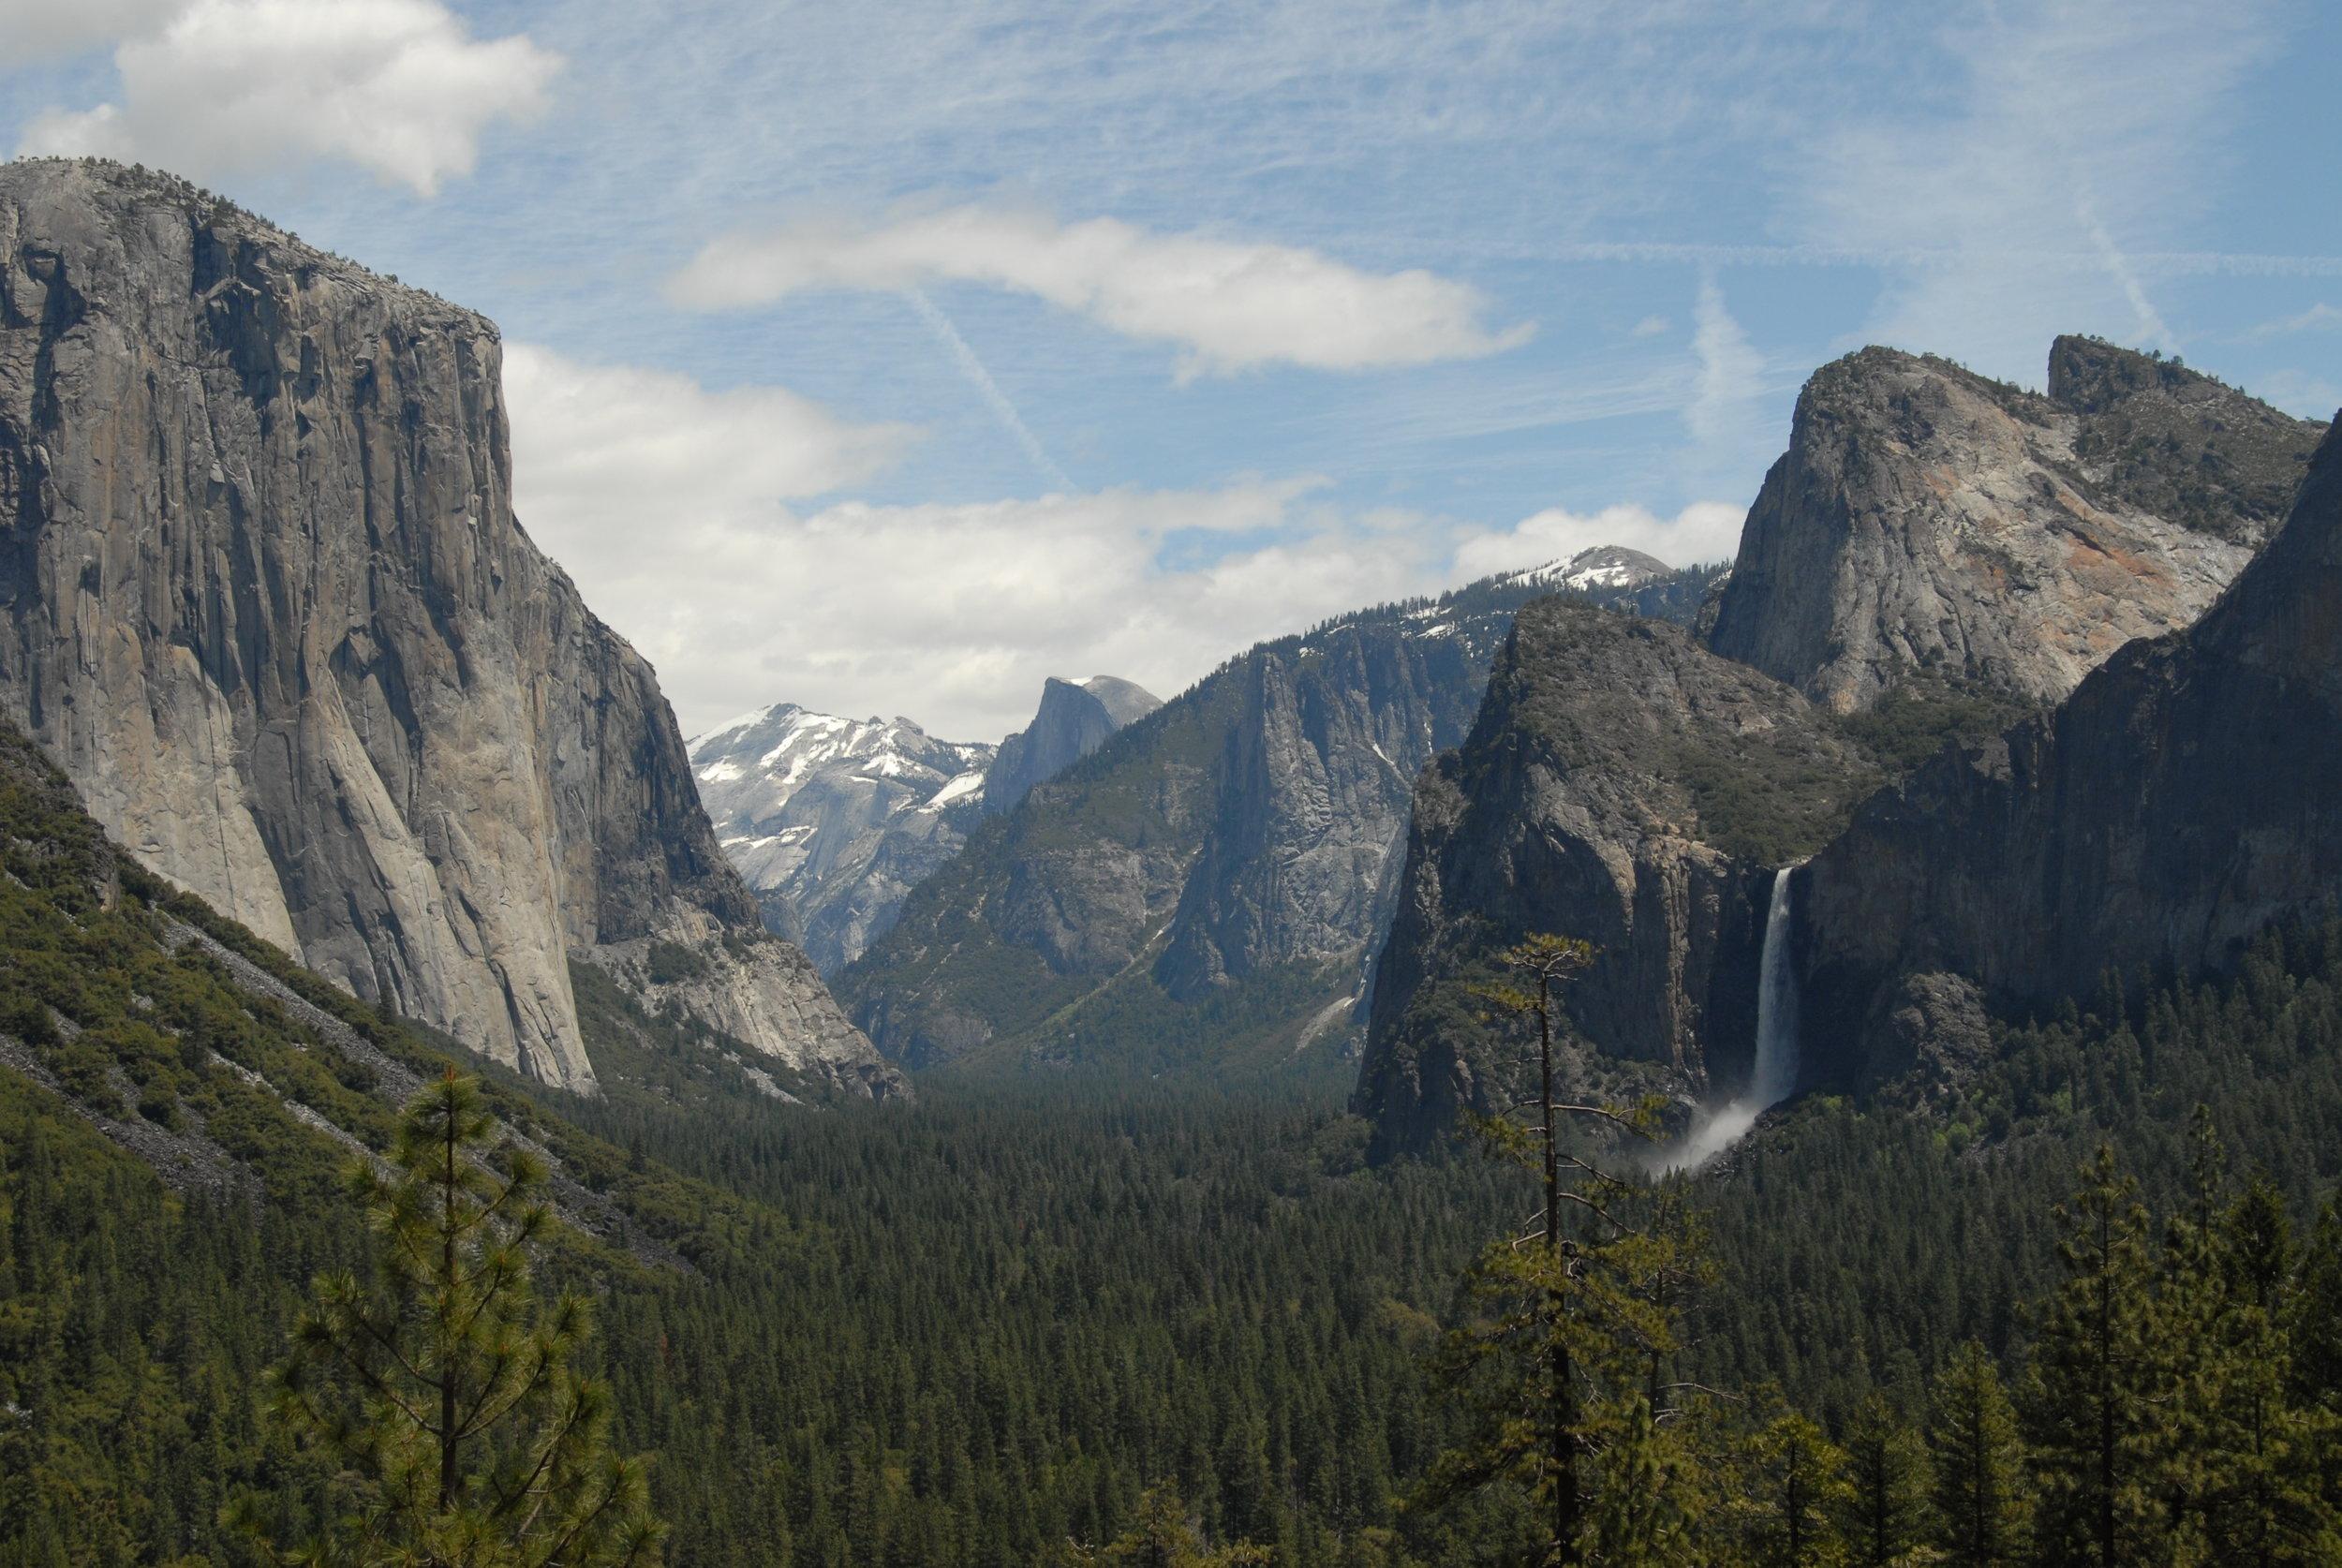 Infamous Yosemite National Park!